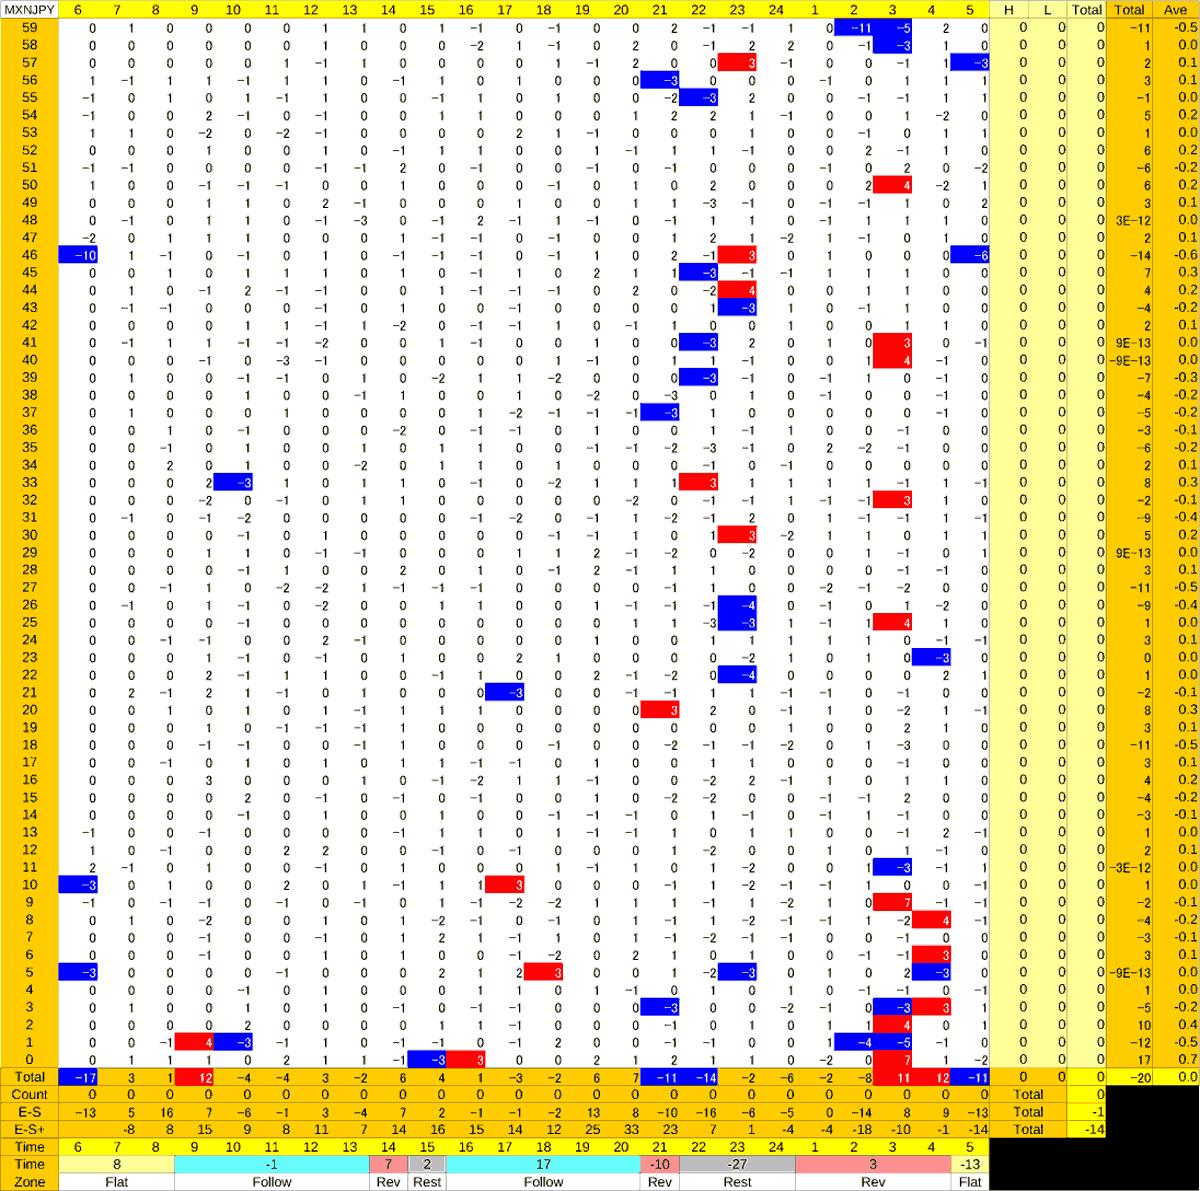 20200729_HS(3)MXNJPY